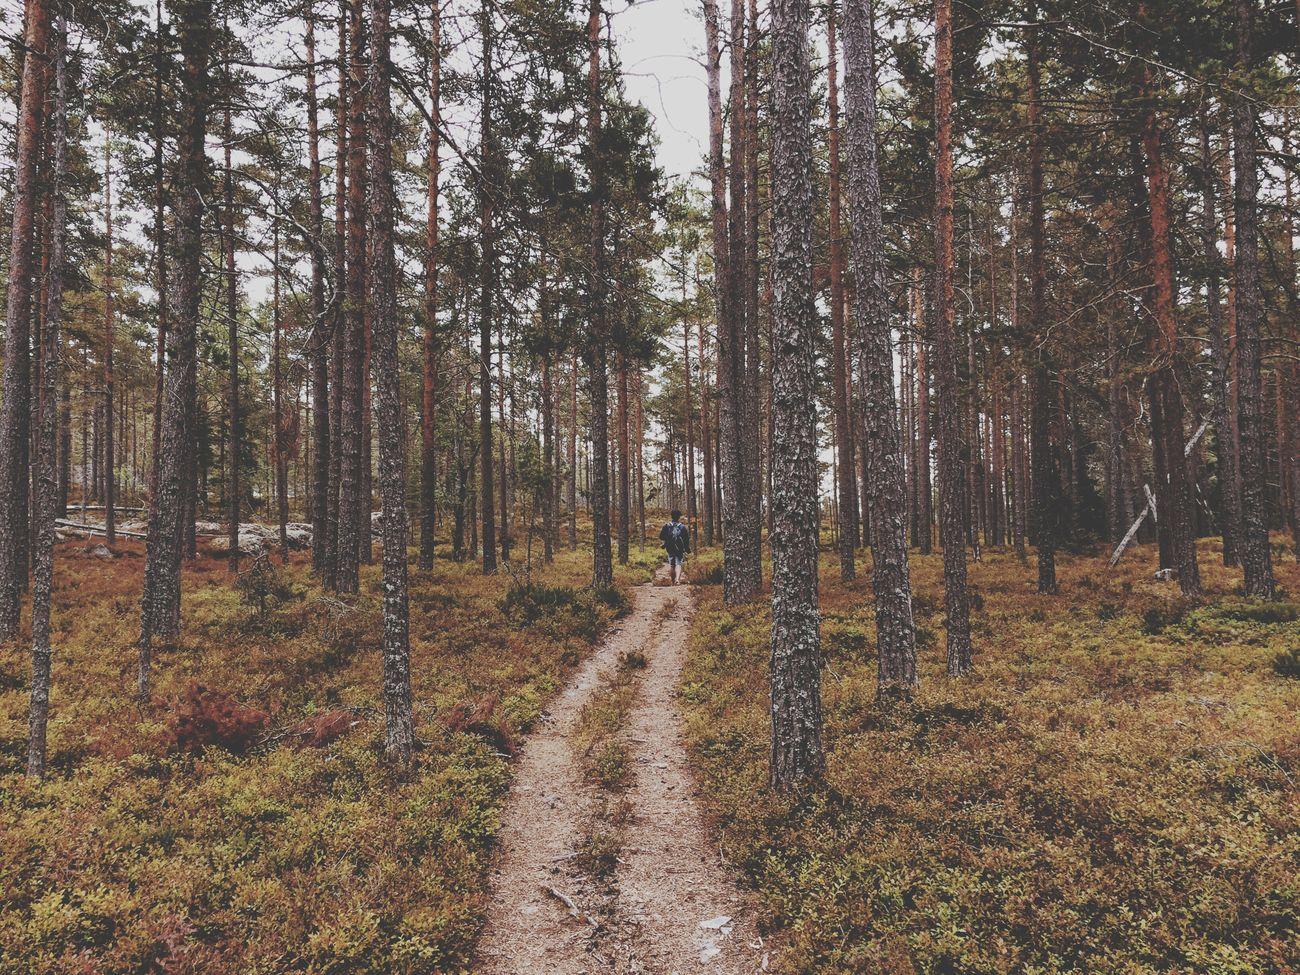 Forest pt. 2 Vscocam Travelphotography Sweden Forest